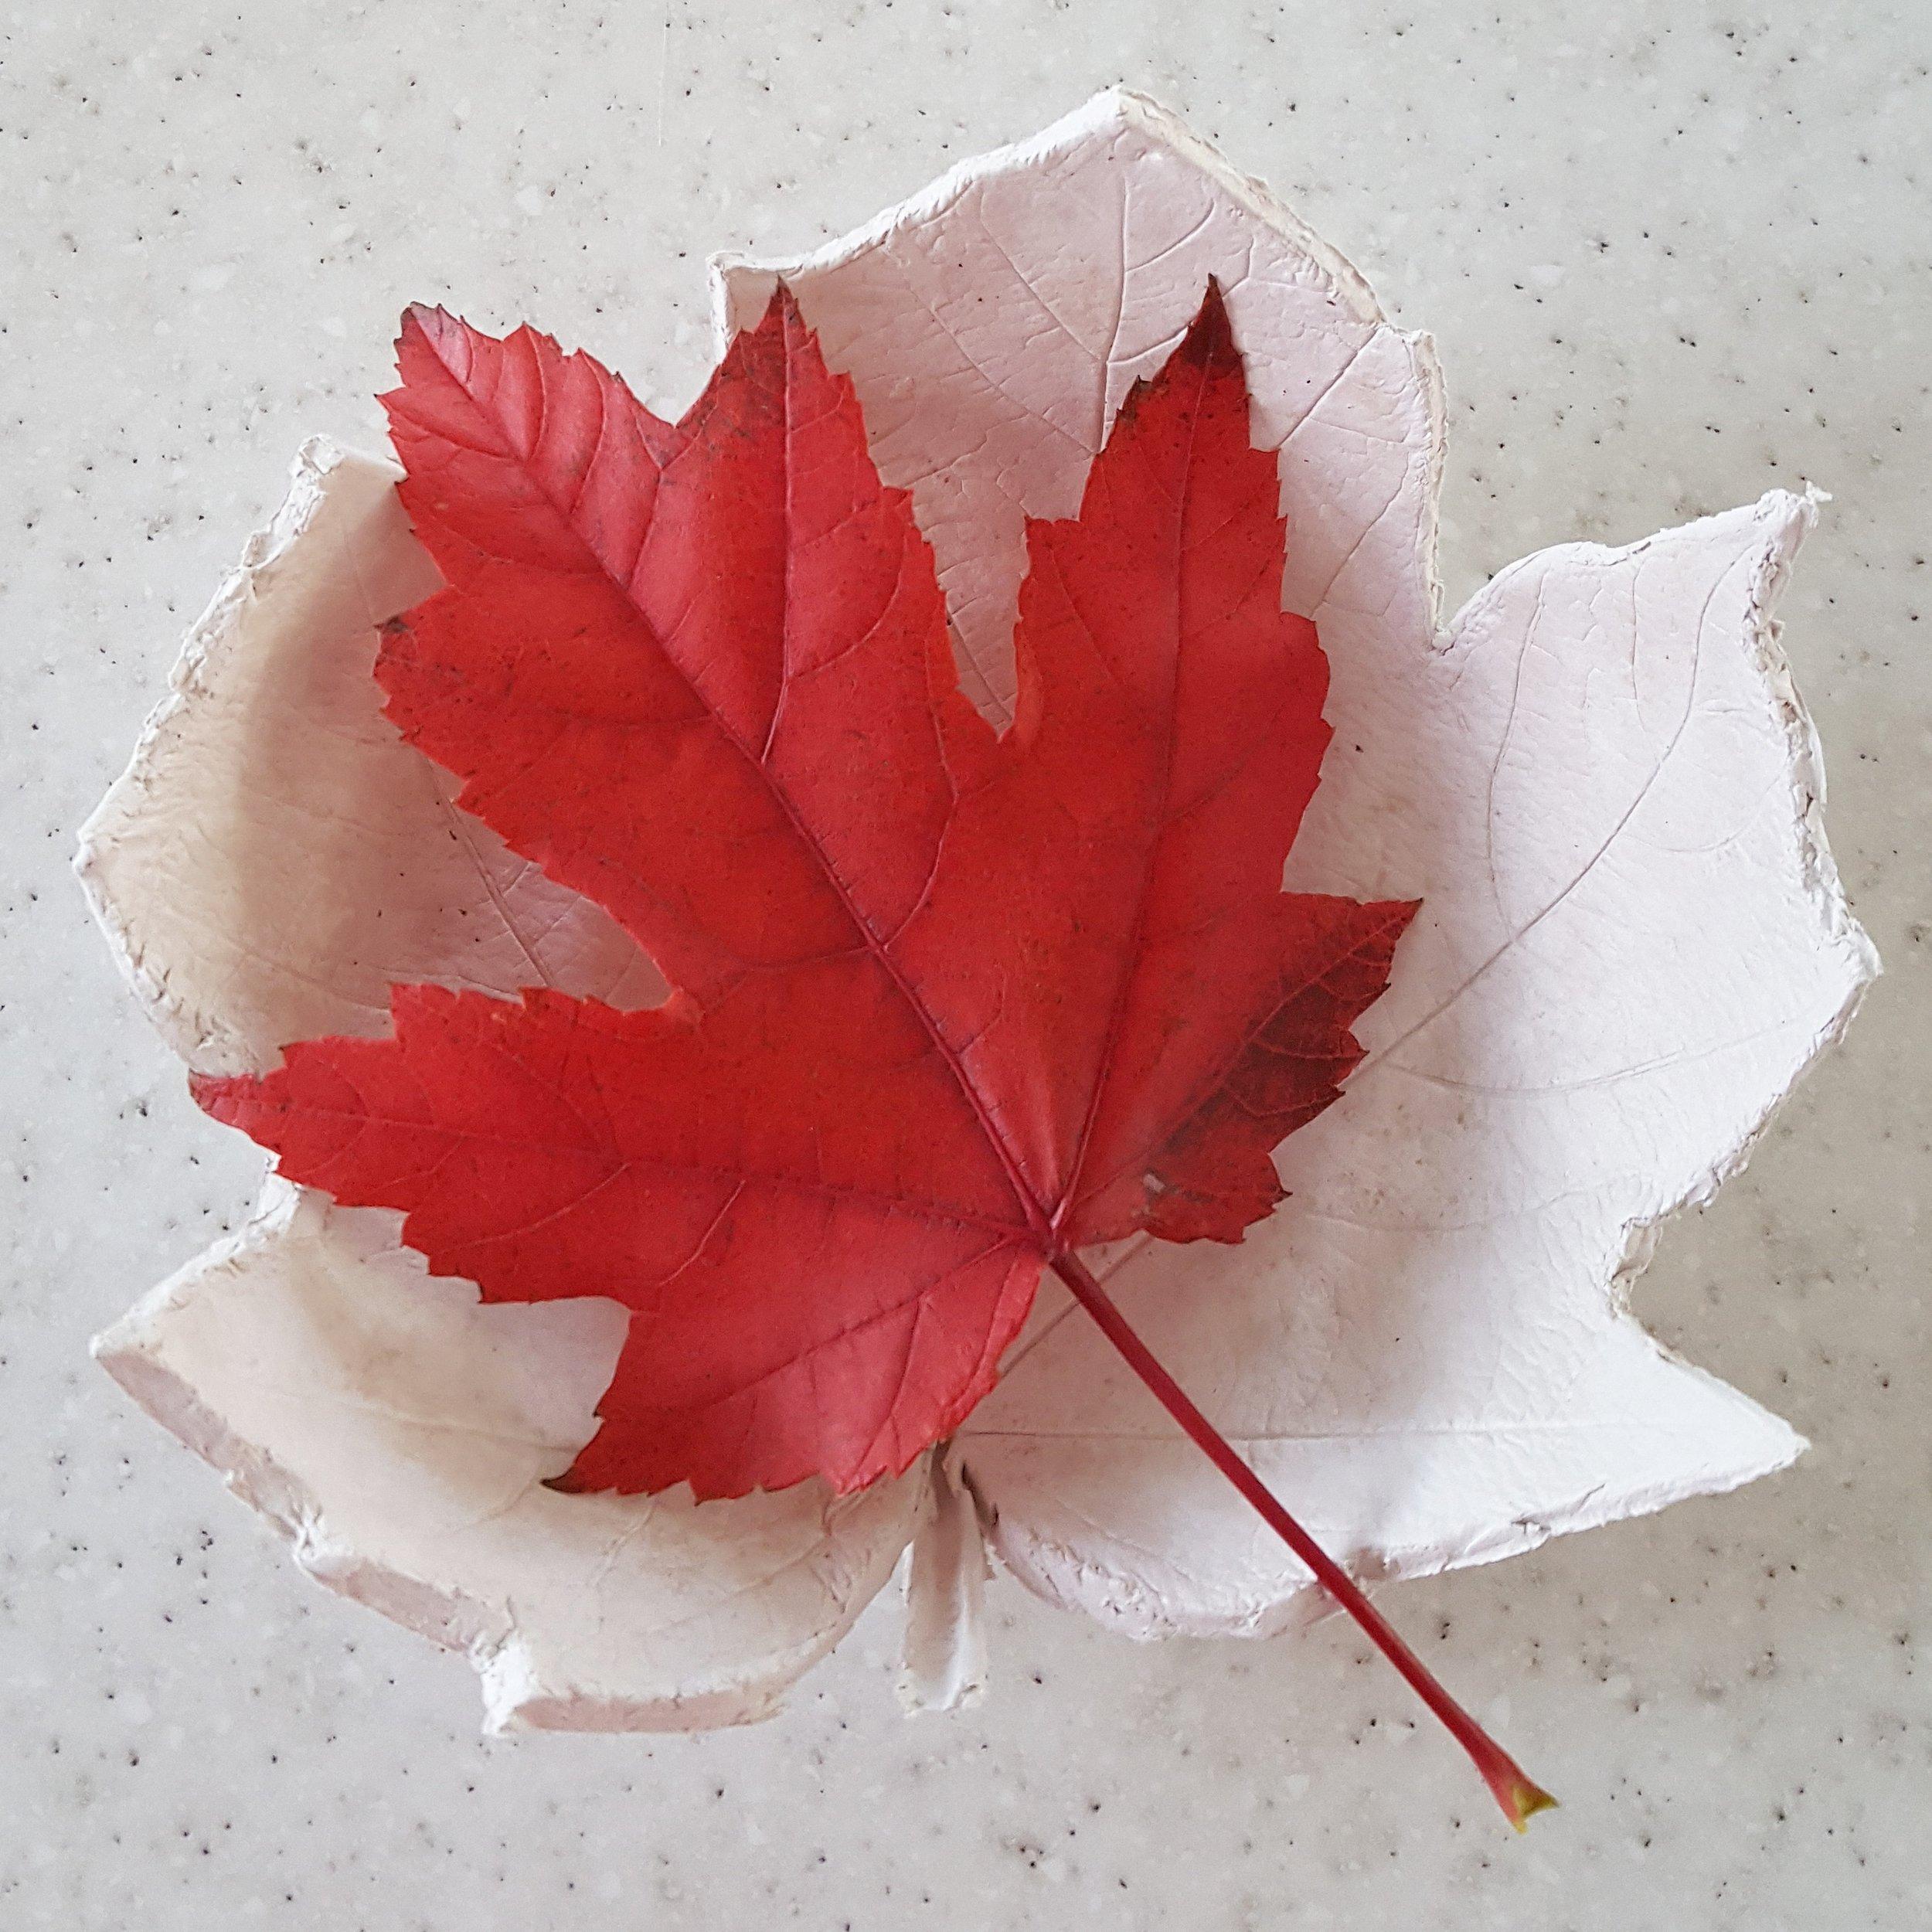 Matthew's finished maple leaf